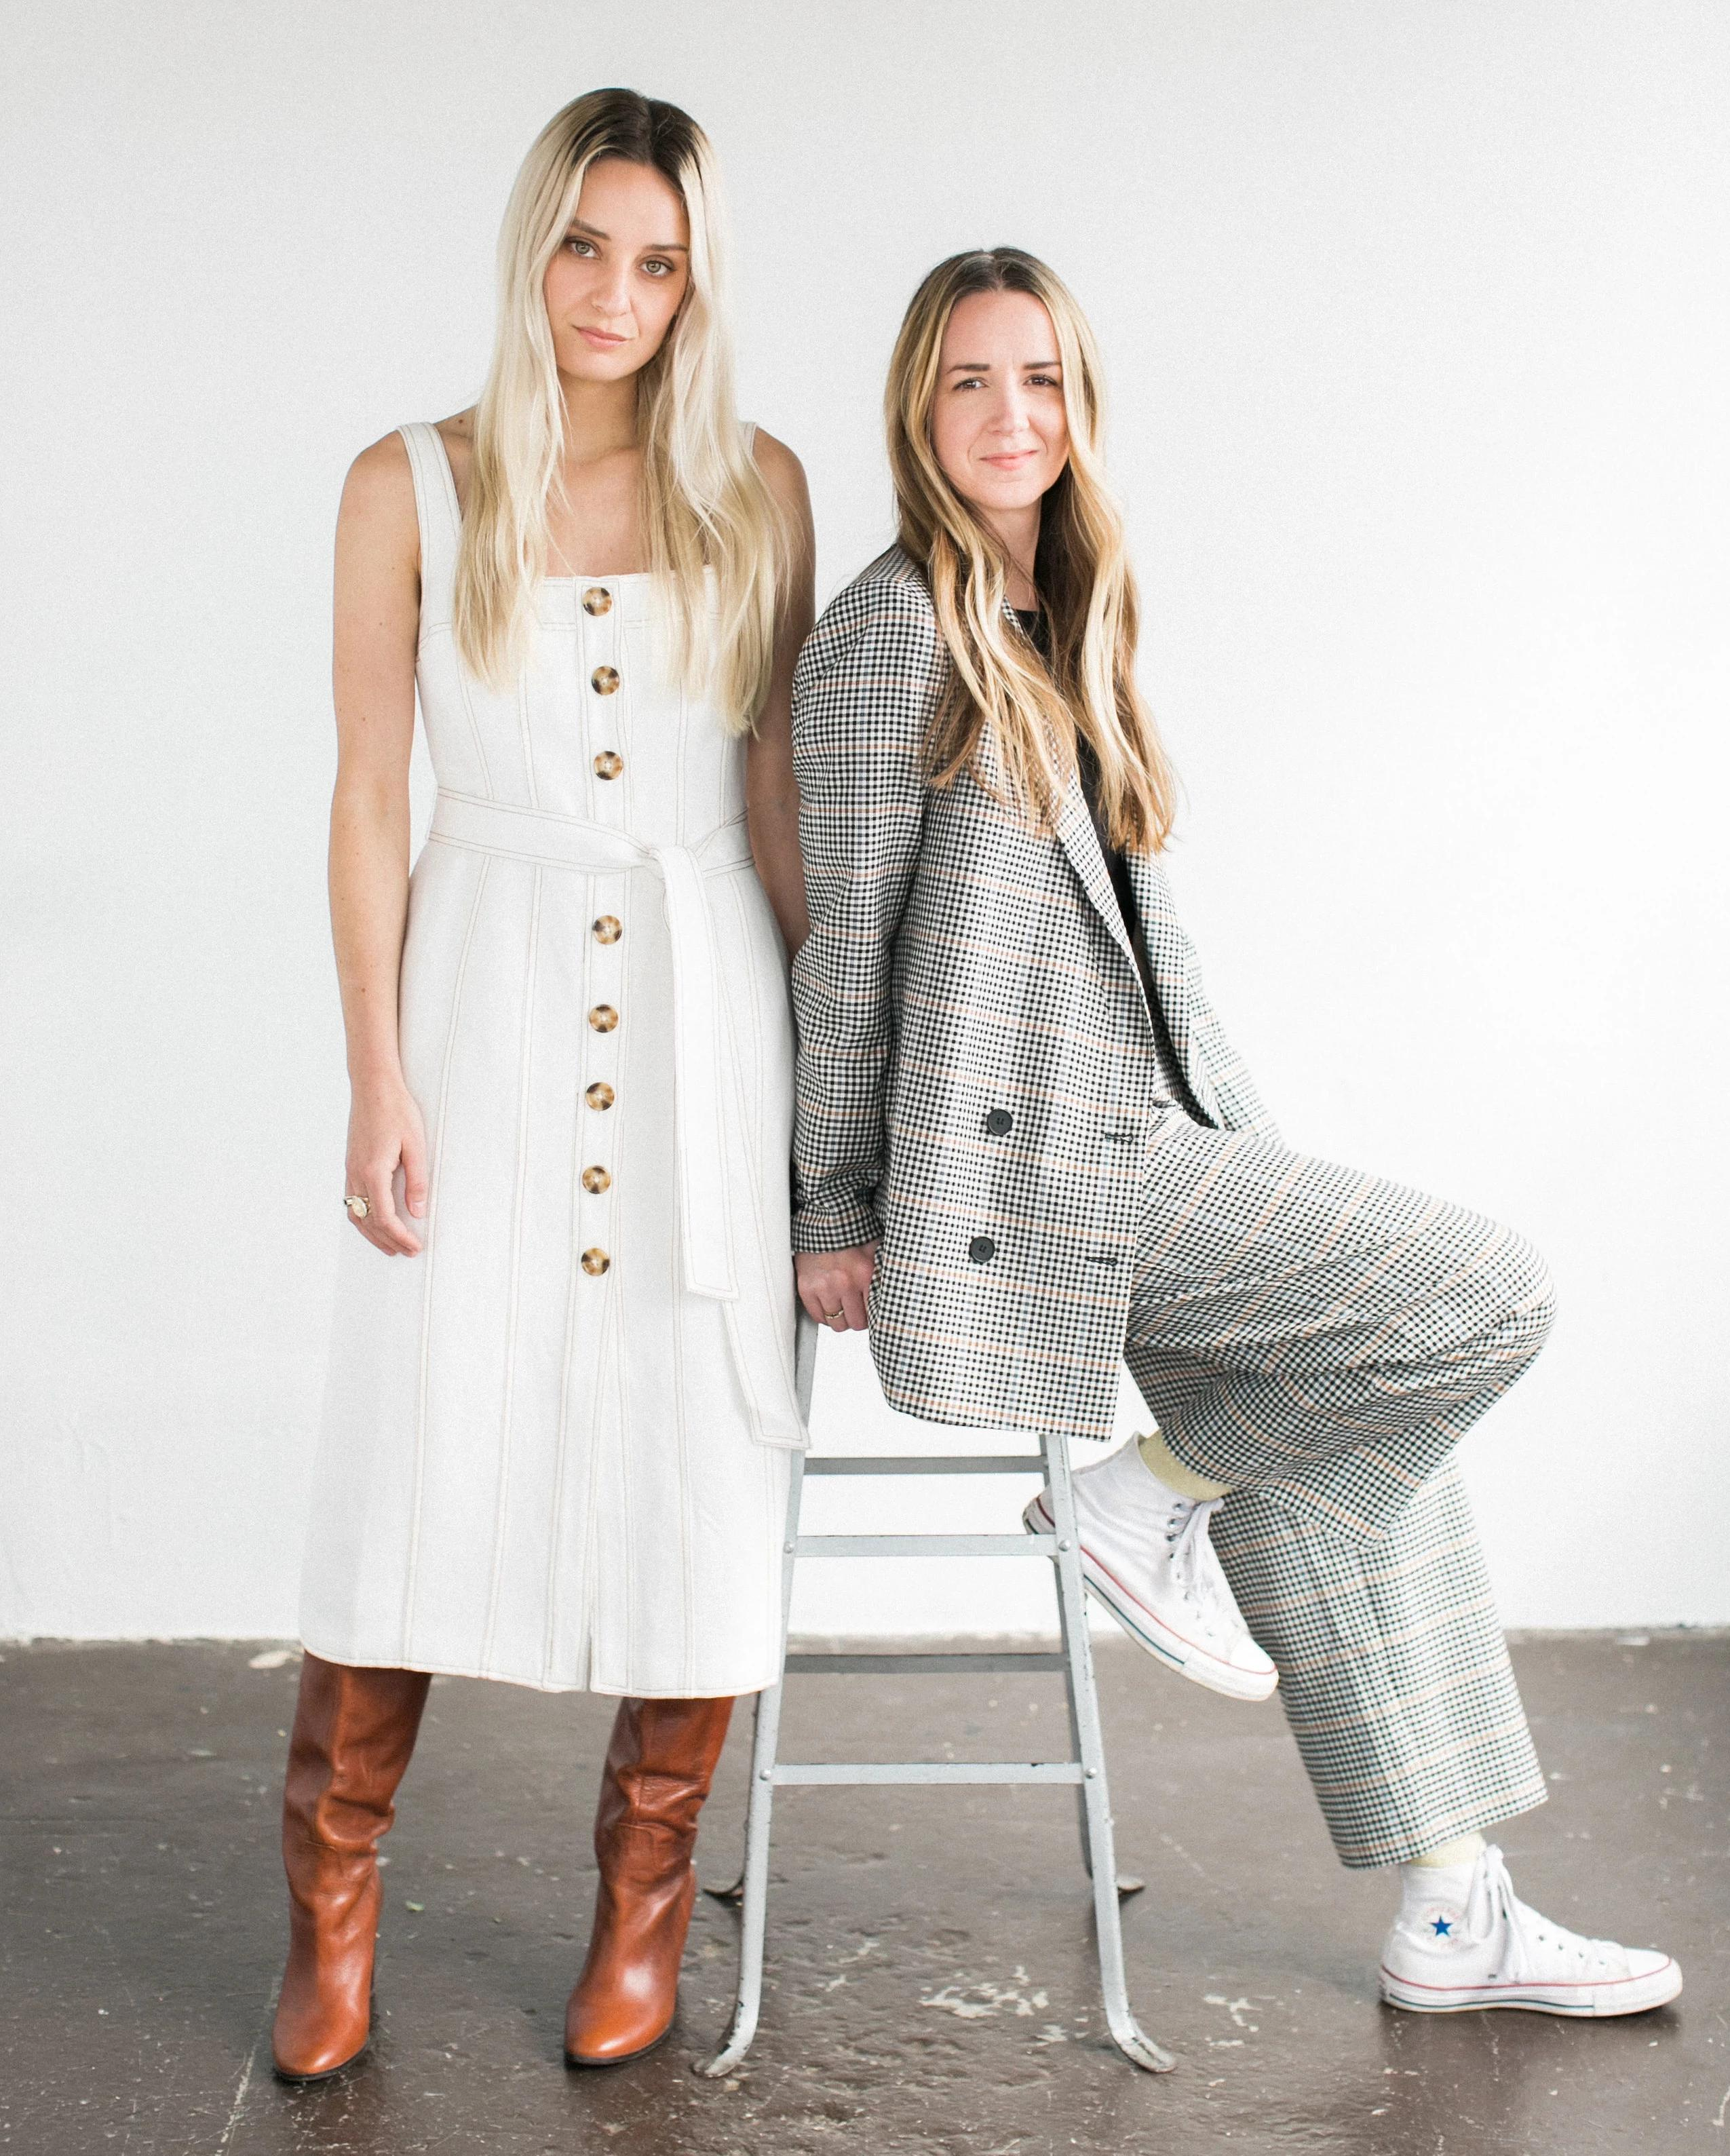 loversland boutique team photo